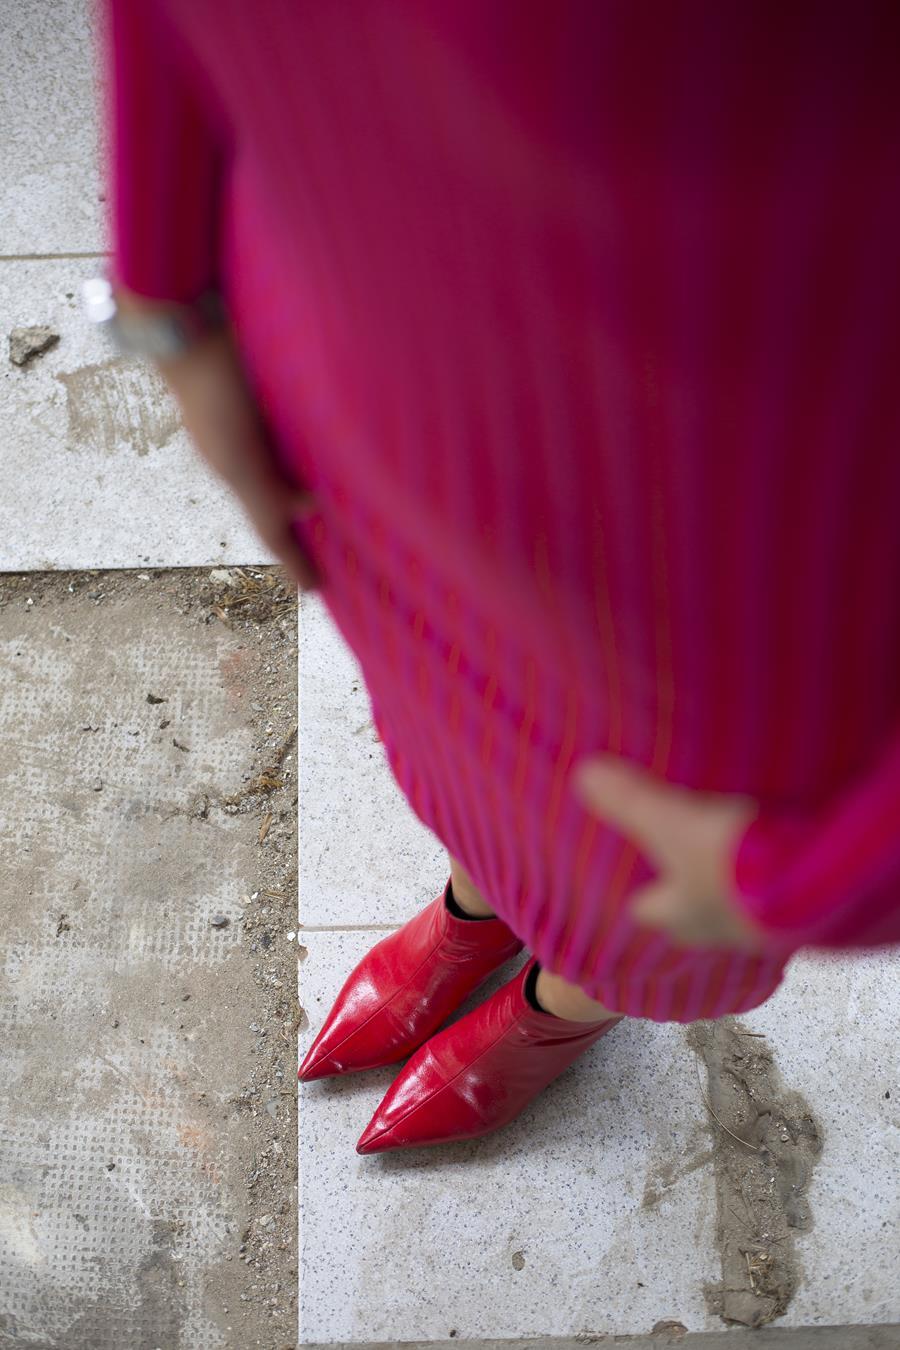 Rebeca Valdivia, asesora de imagen, personal shopper, estilista, stilist, influencer, Donostia, San Sebastián, Miss Clov, la blogger indie, influencer, dress, vestido canalé, rosa, pink, botines rojos, tomboystyle, graffitis